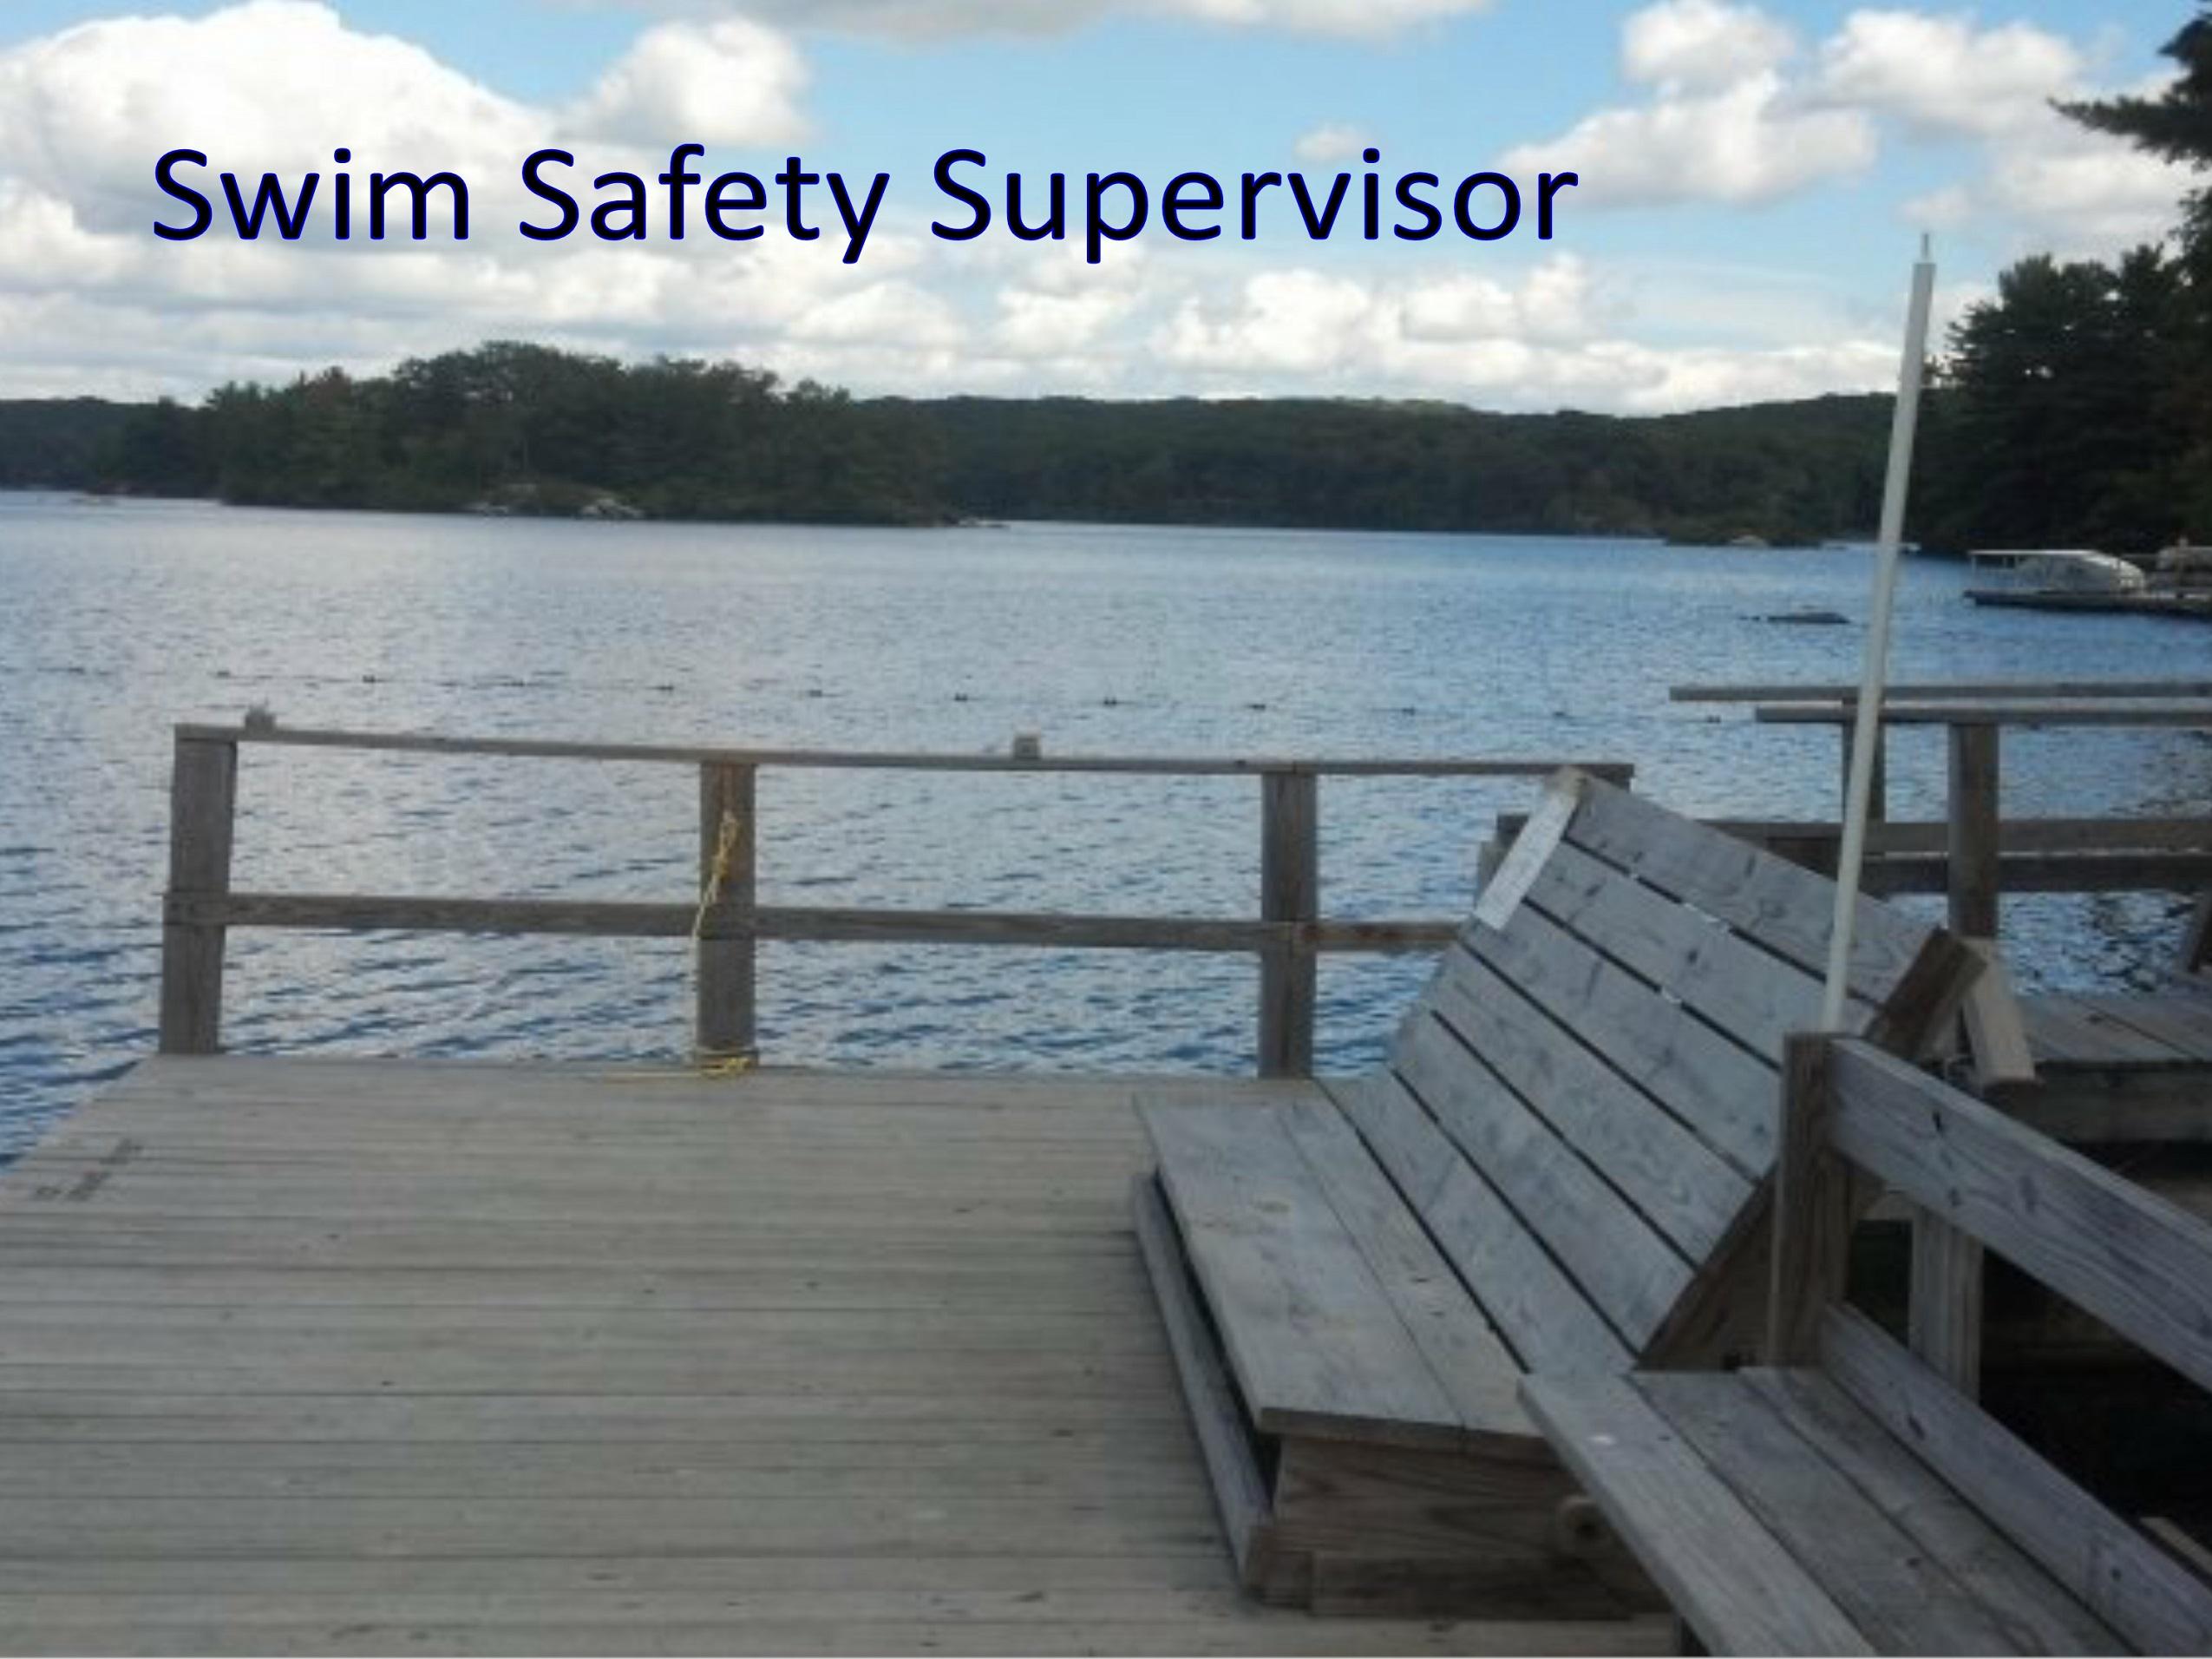 Swim Safety Supervisor